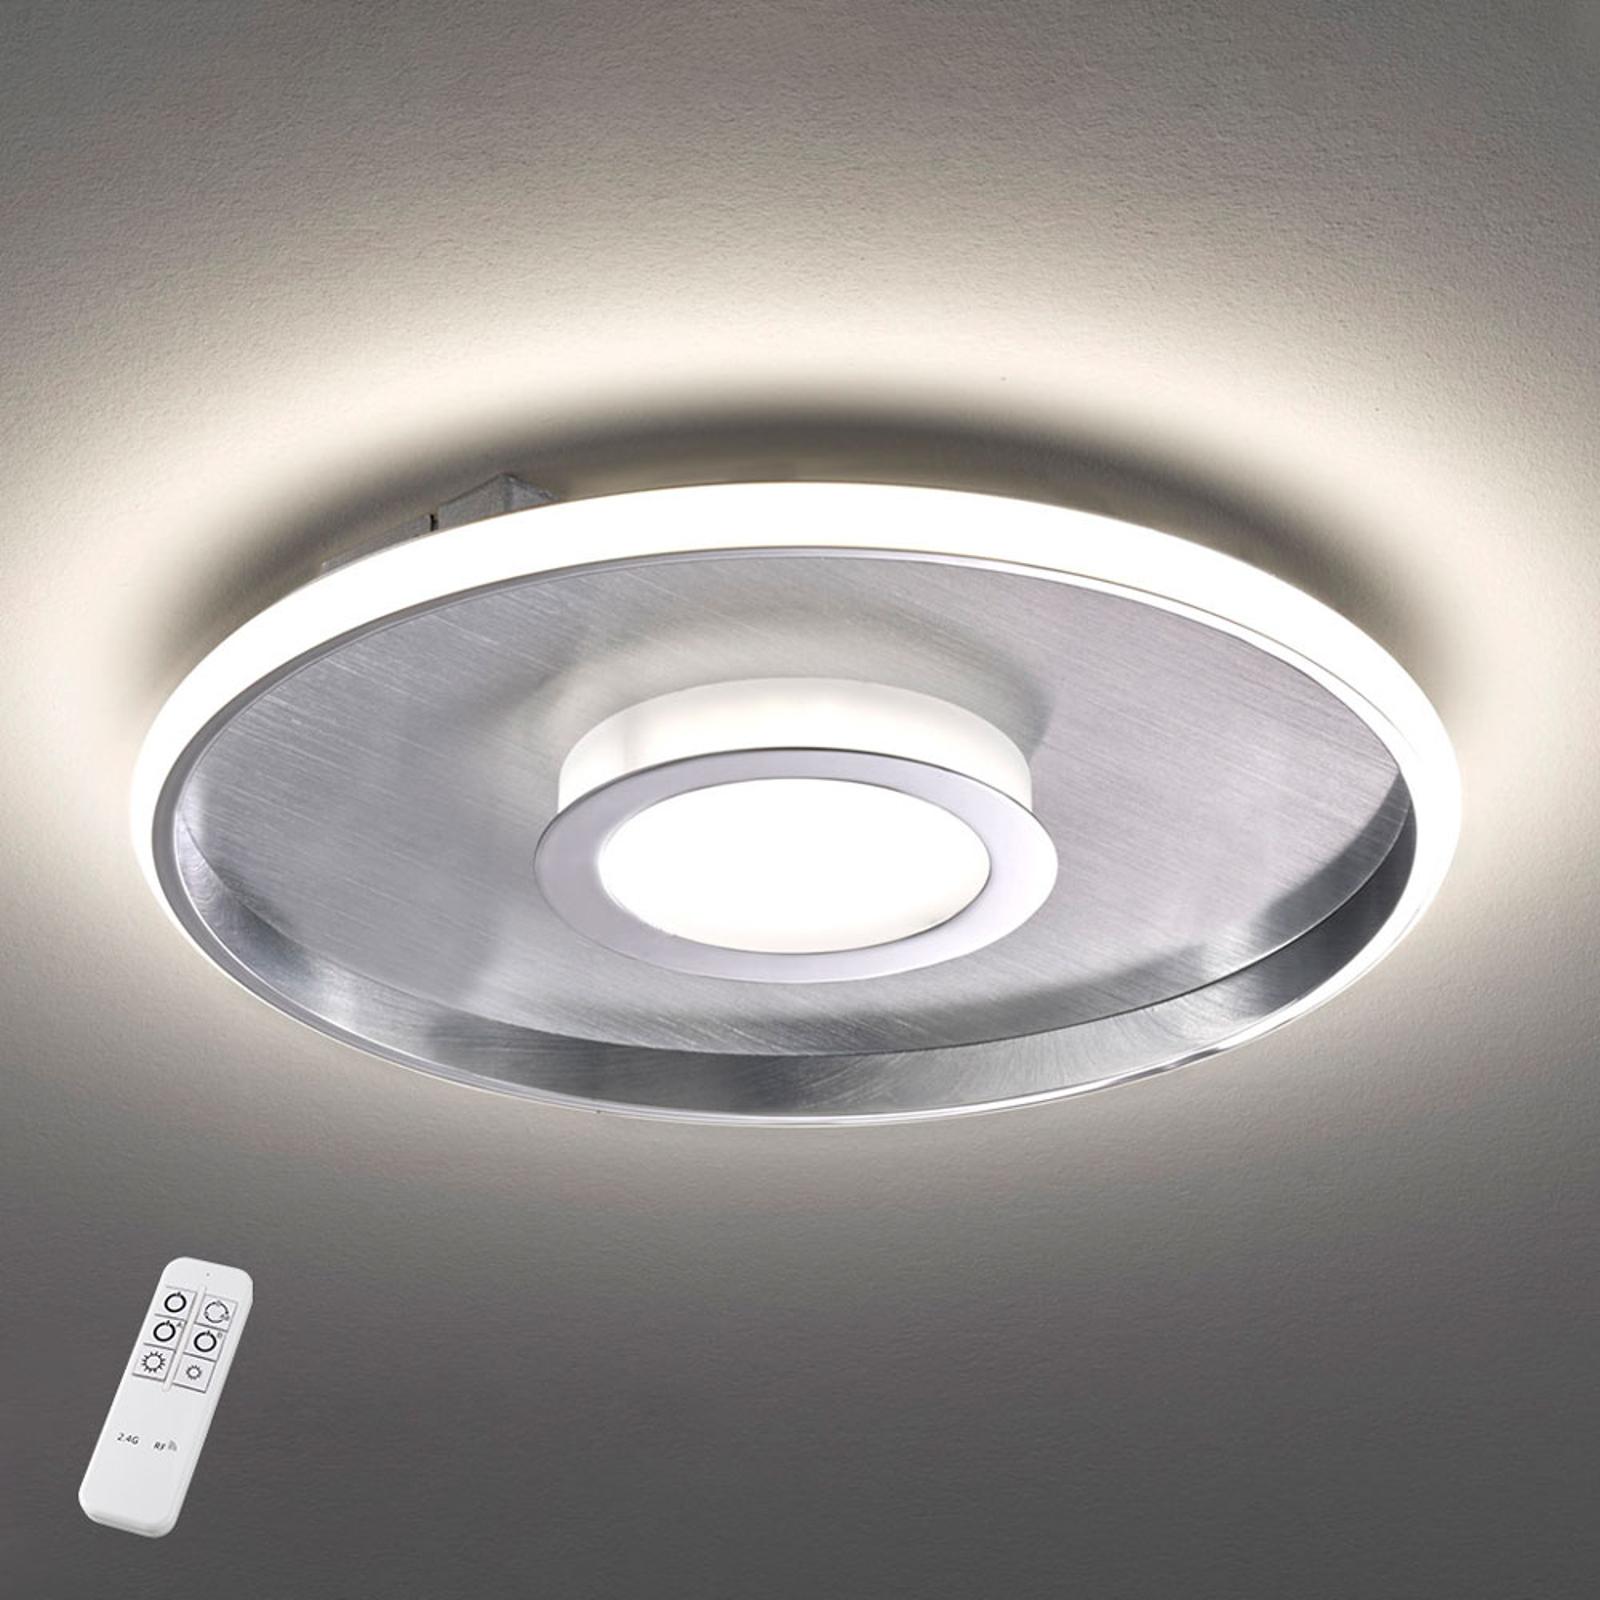 Lampa sufitowa LED Bug okrągła, chrom 45cm